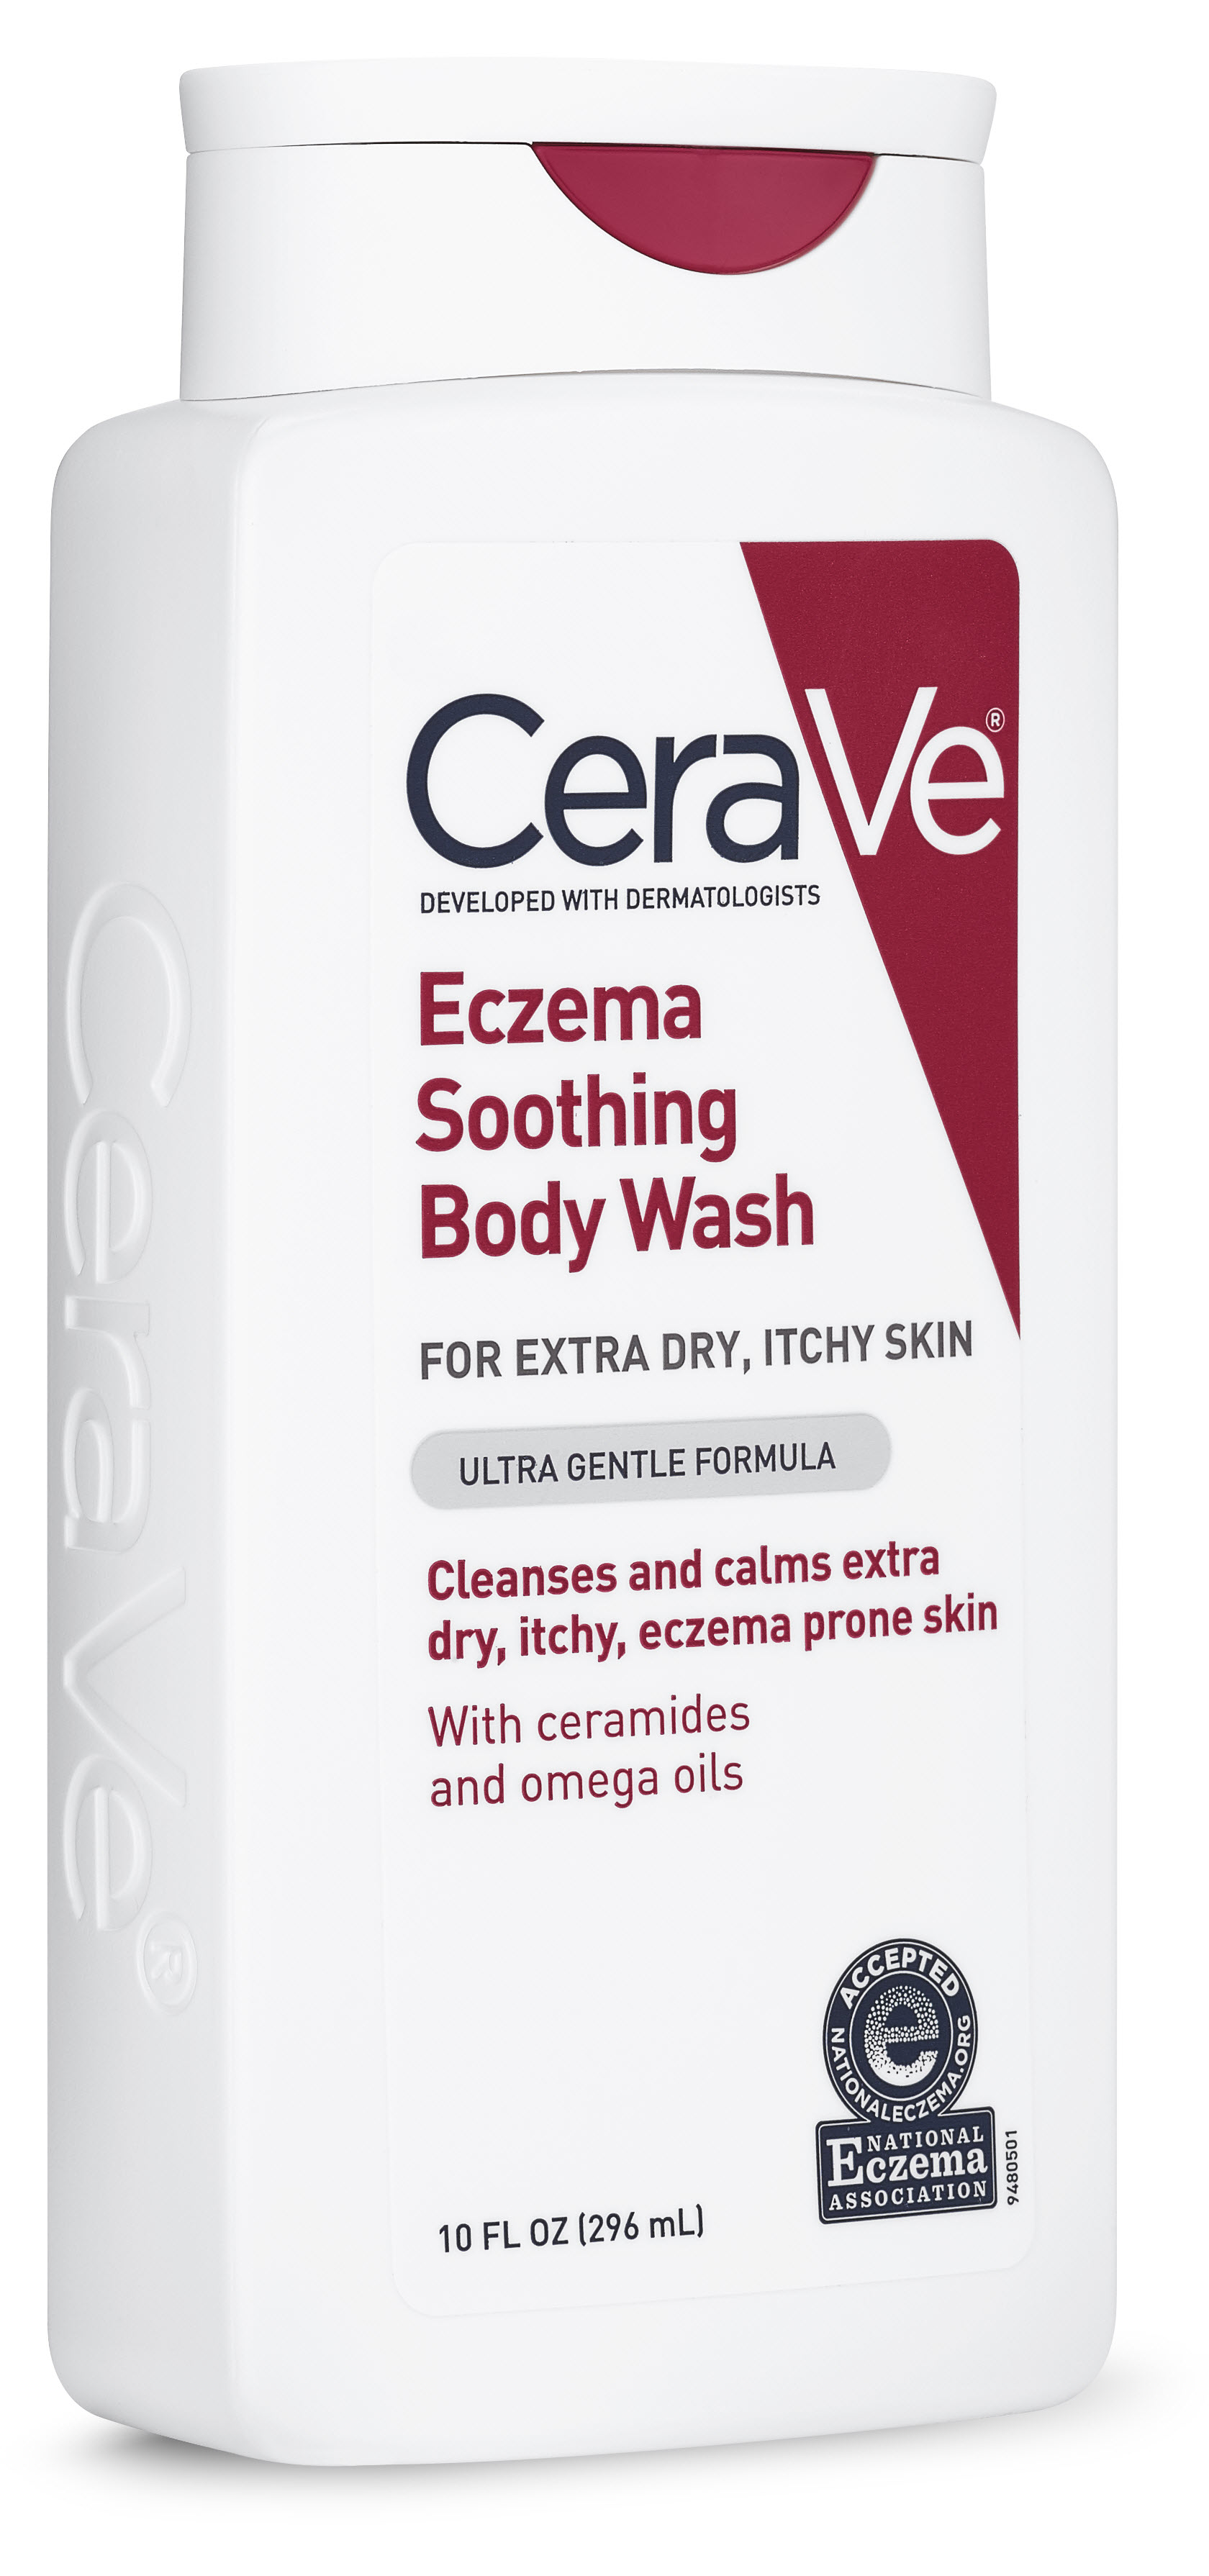 5 Ultra-Calming Ingredients to Soothe Eczema 5 Ultra-Calming Ingredients to Soothe Eczema new photo